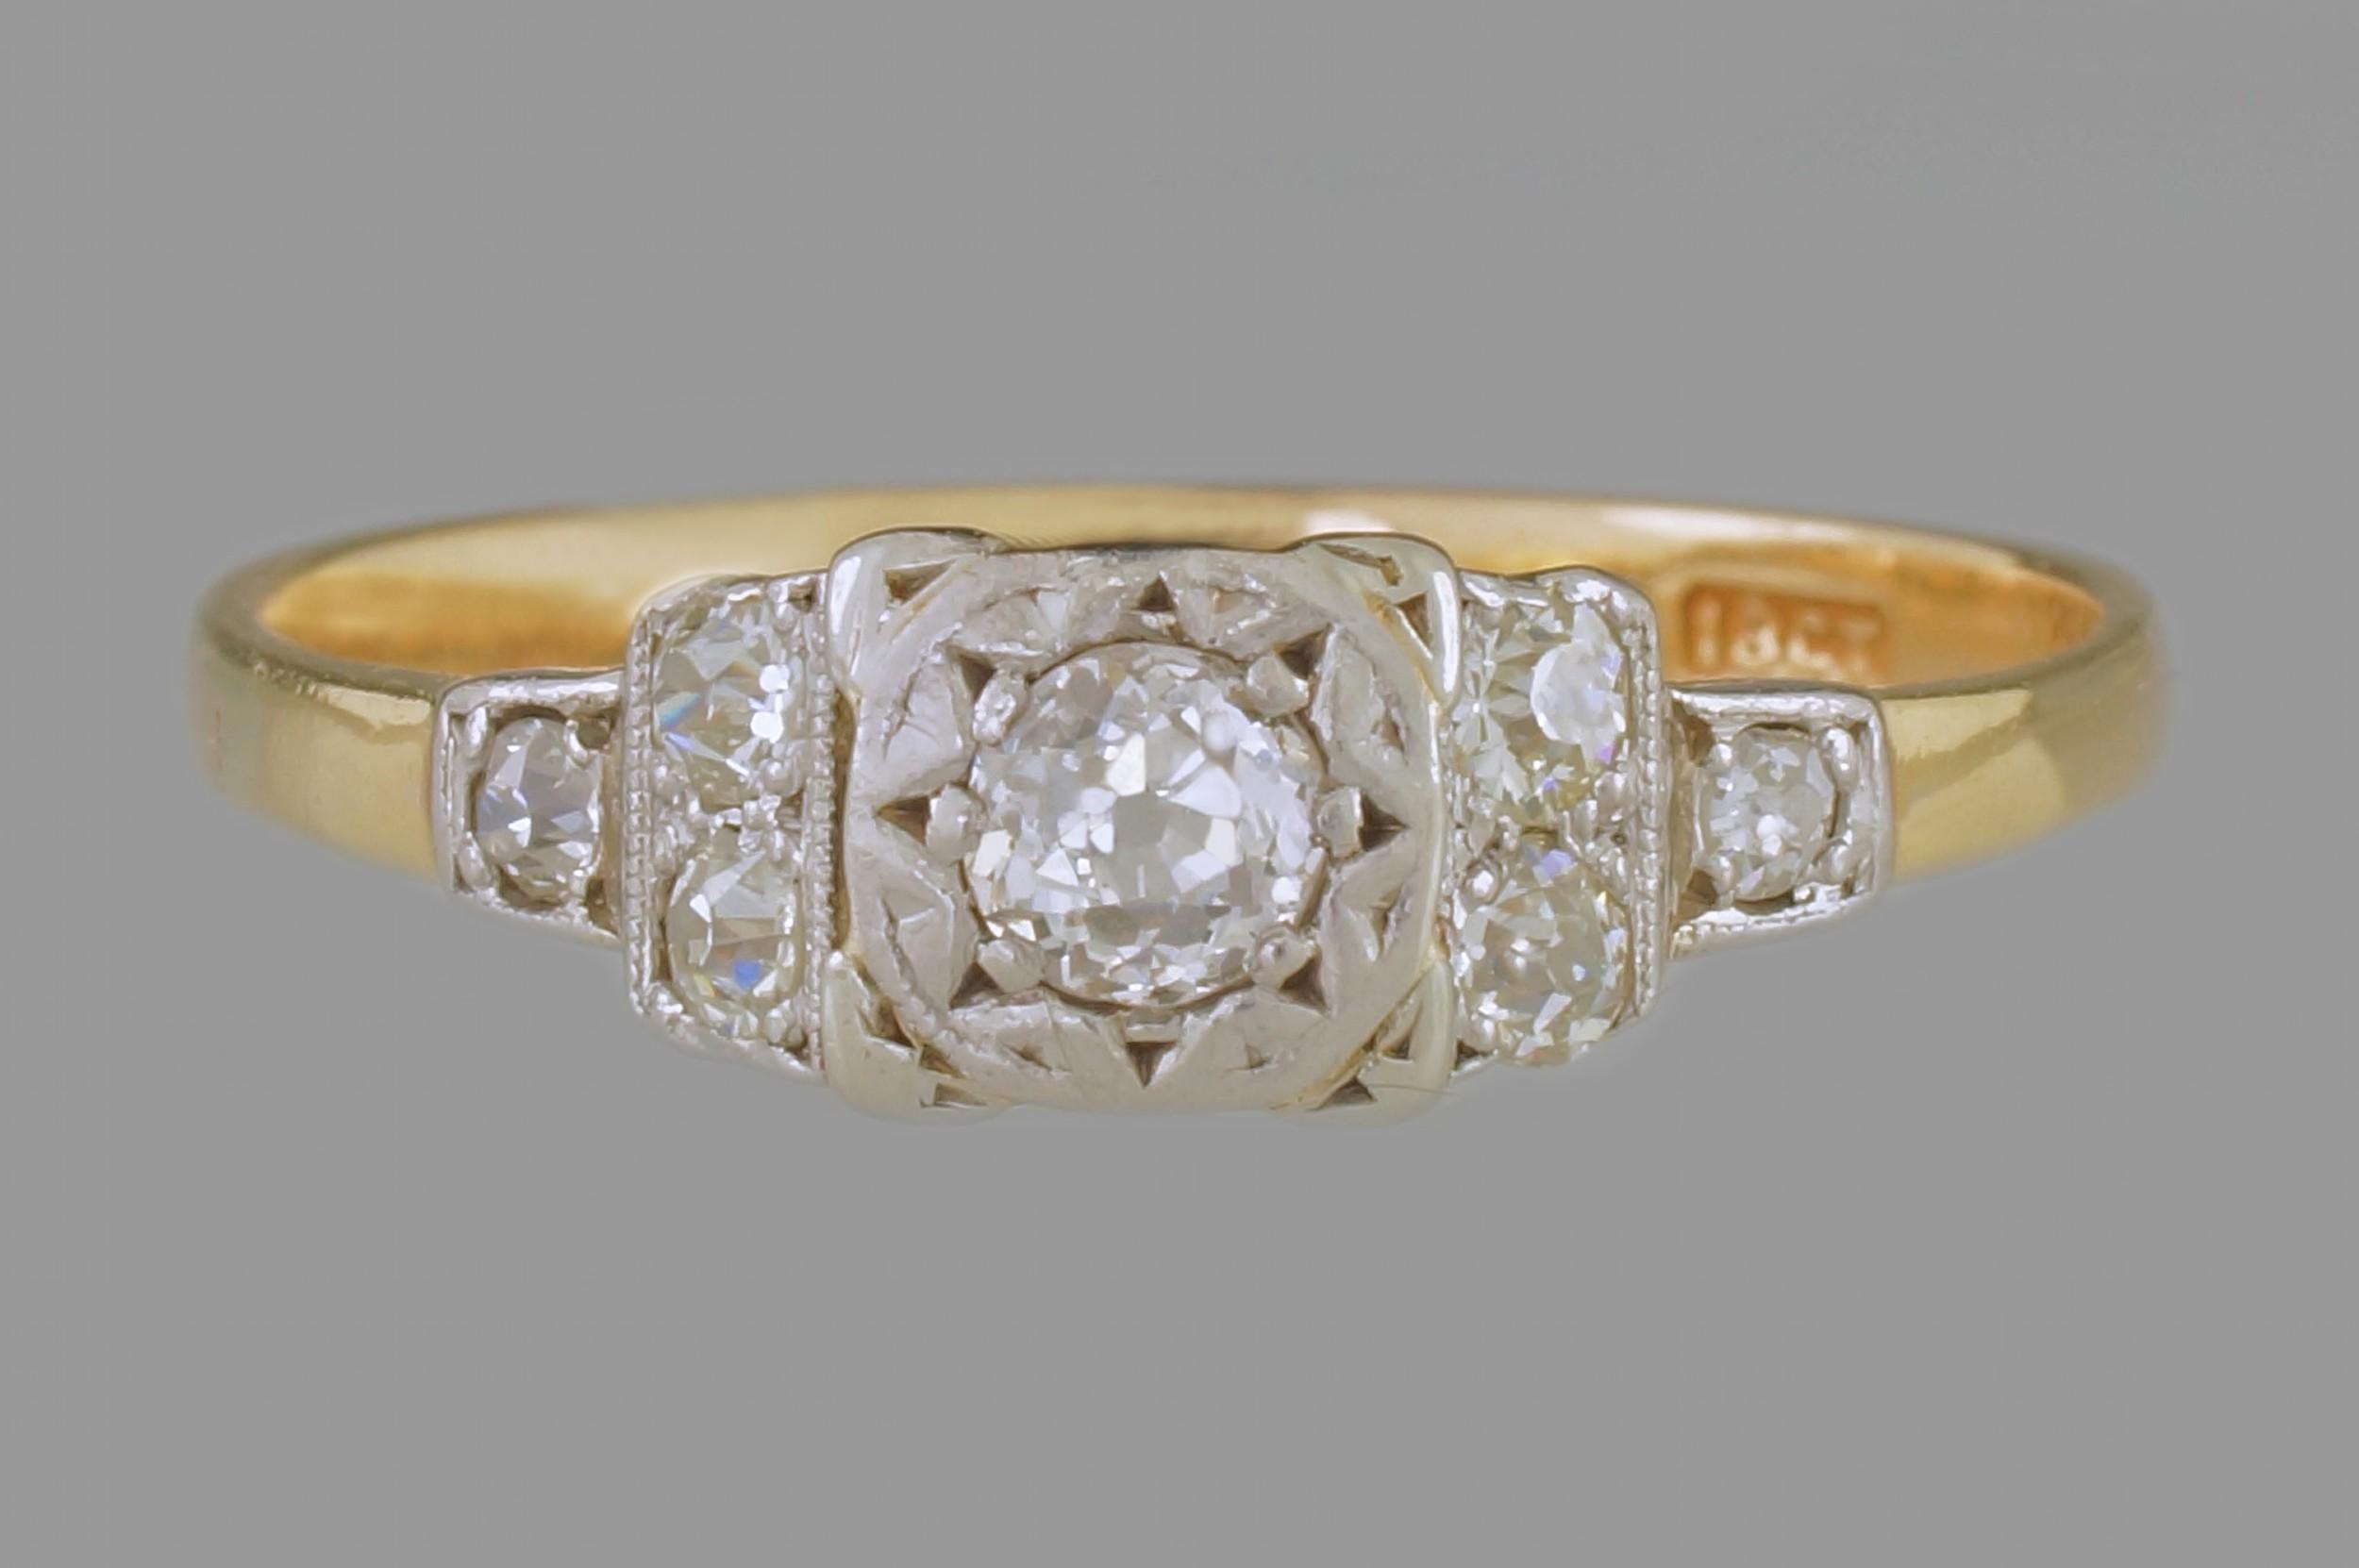 Old Mine Cut Diamond Ring Genuine Edwardian 18ct Gold Platinum Engagement: Genuine Edwardian Wedding Rings At Websimilar.org